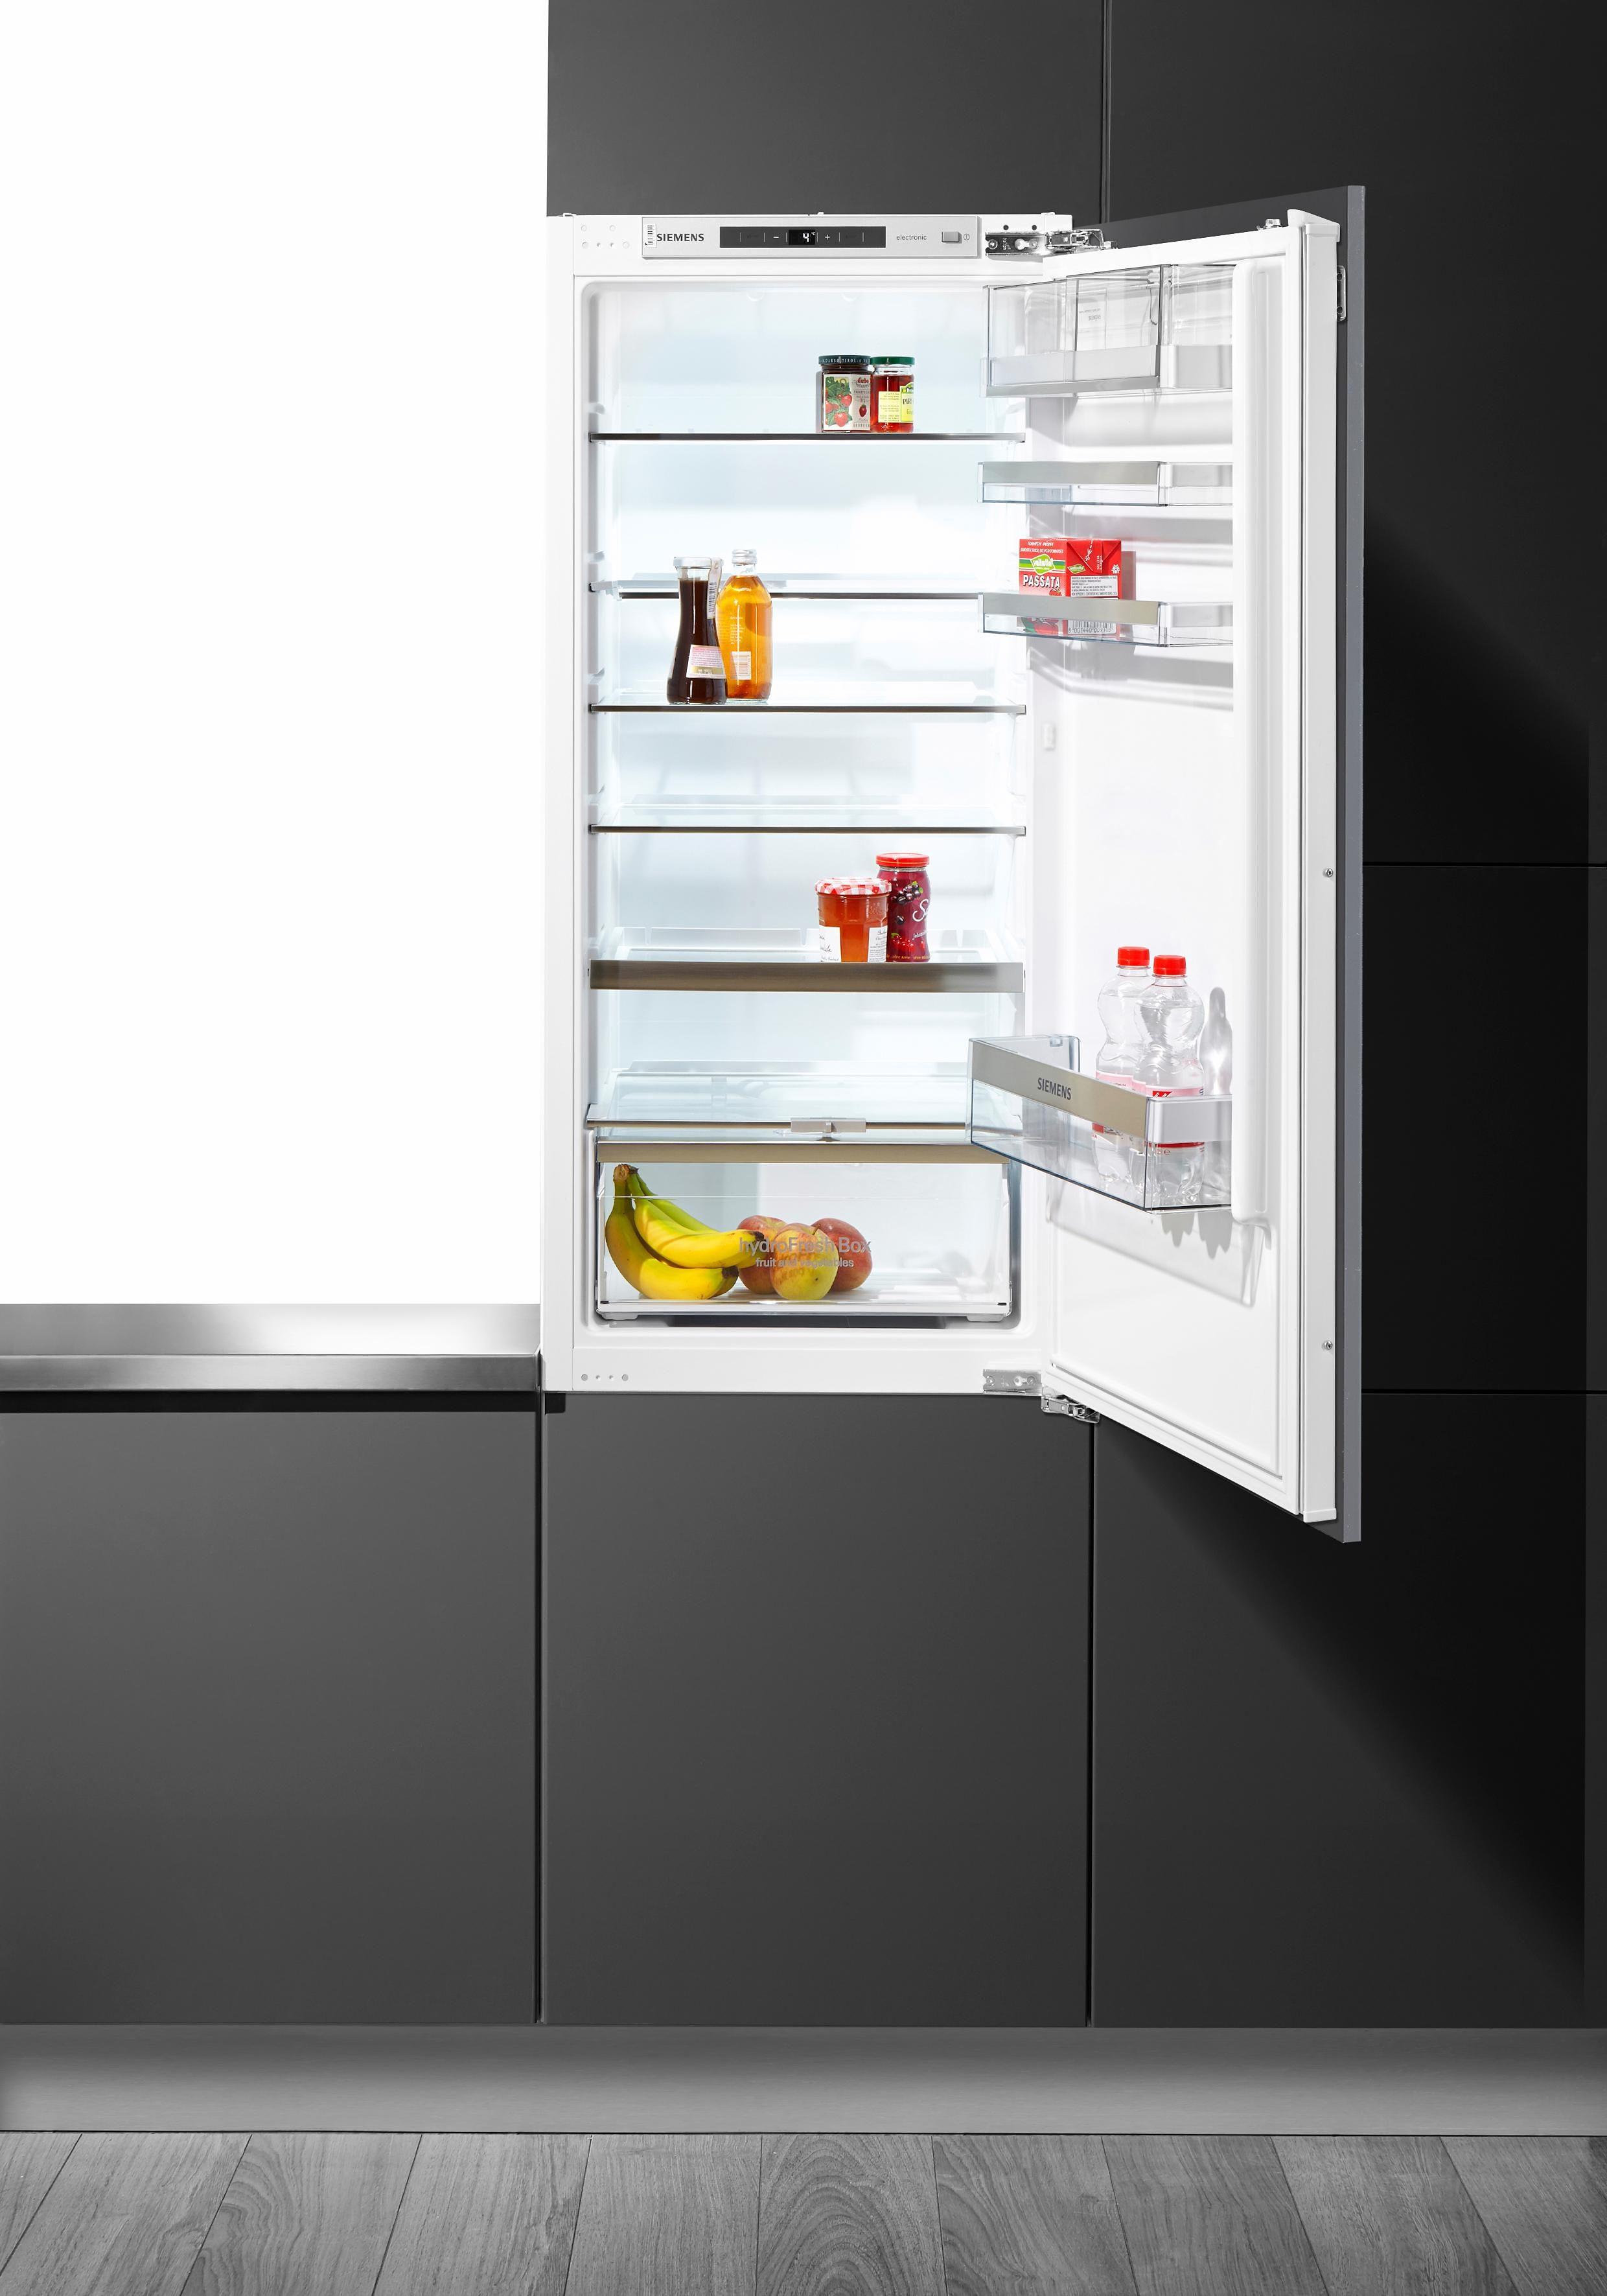 Siemens integrierbarer Einbau-Kühlschrank KI41RAF30, A++, 122,1 cm hoch